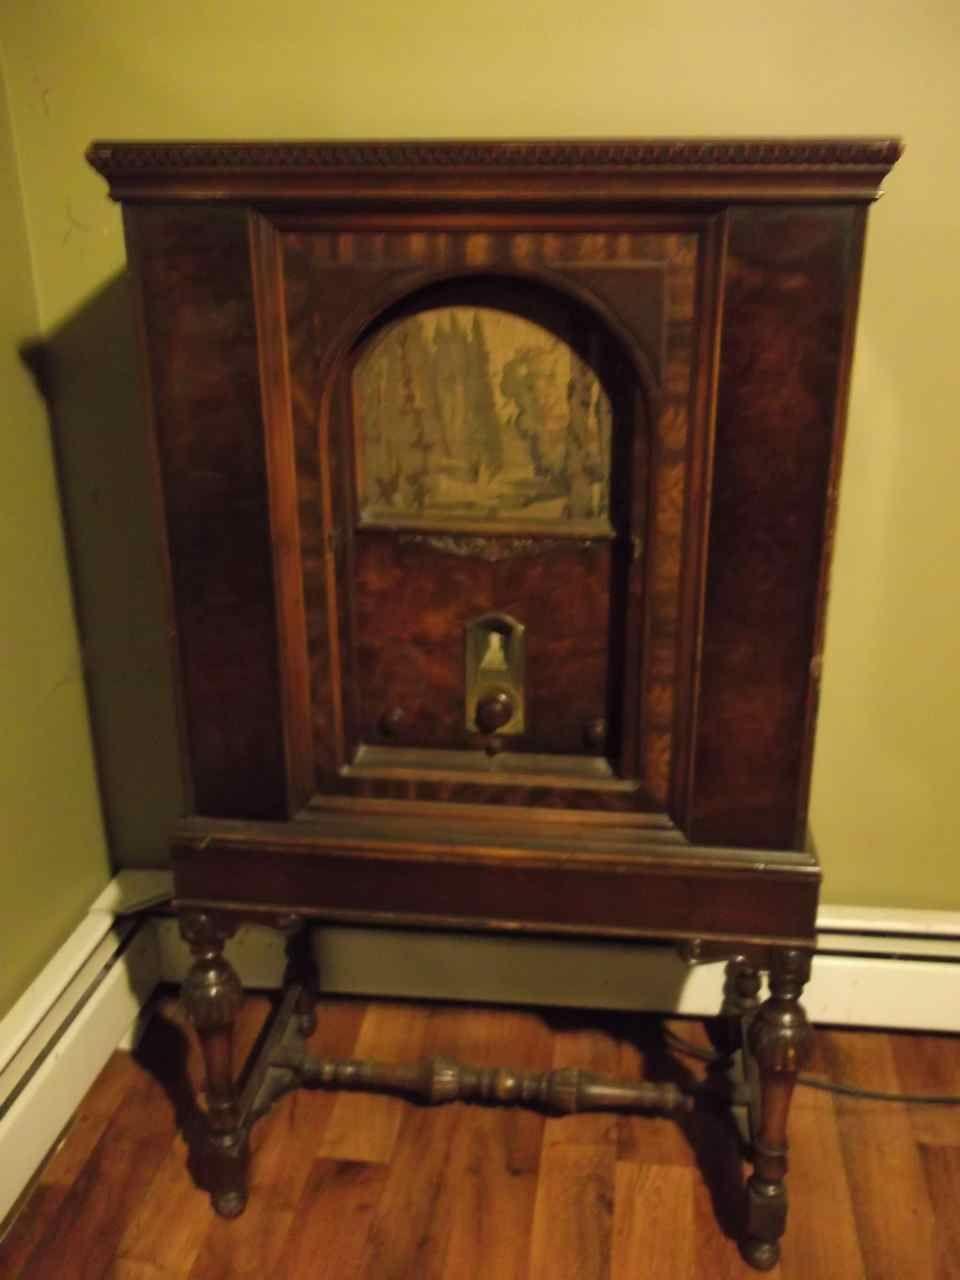 1940s Wooden Philco Radio Cabinet antique appraisal | InstAppraisal - 1940s Wooden Philco Radio Cabinet Antique Appraisal